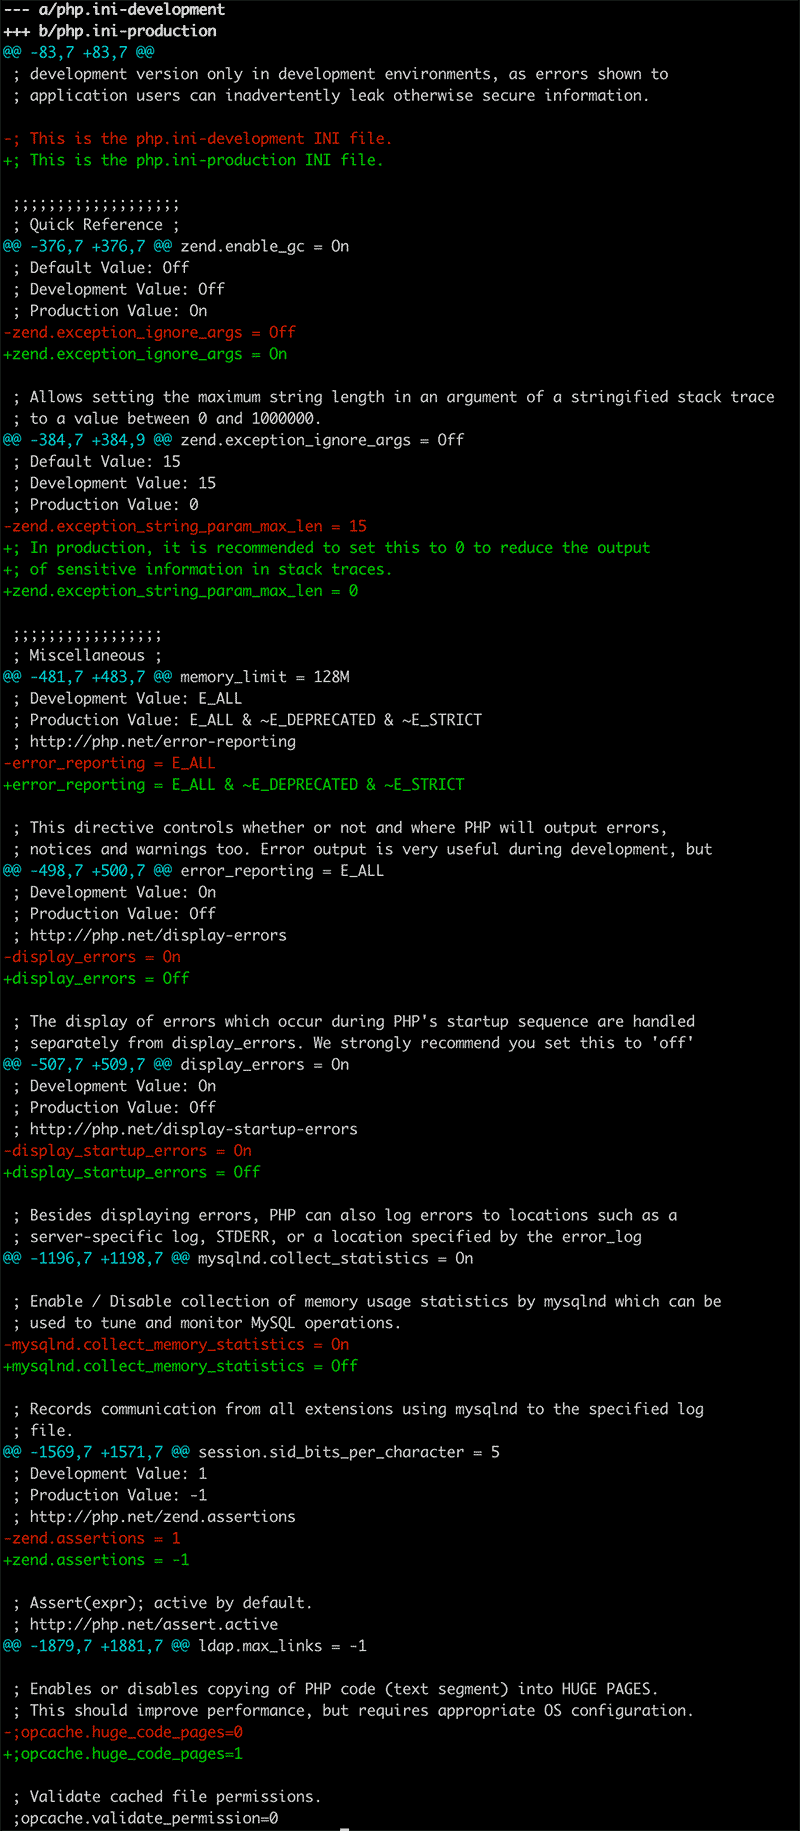 php.ini-developmentとphp.ini-productionの差分